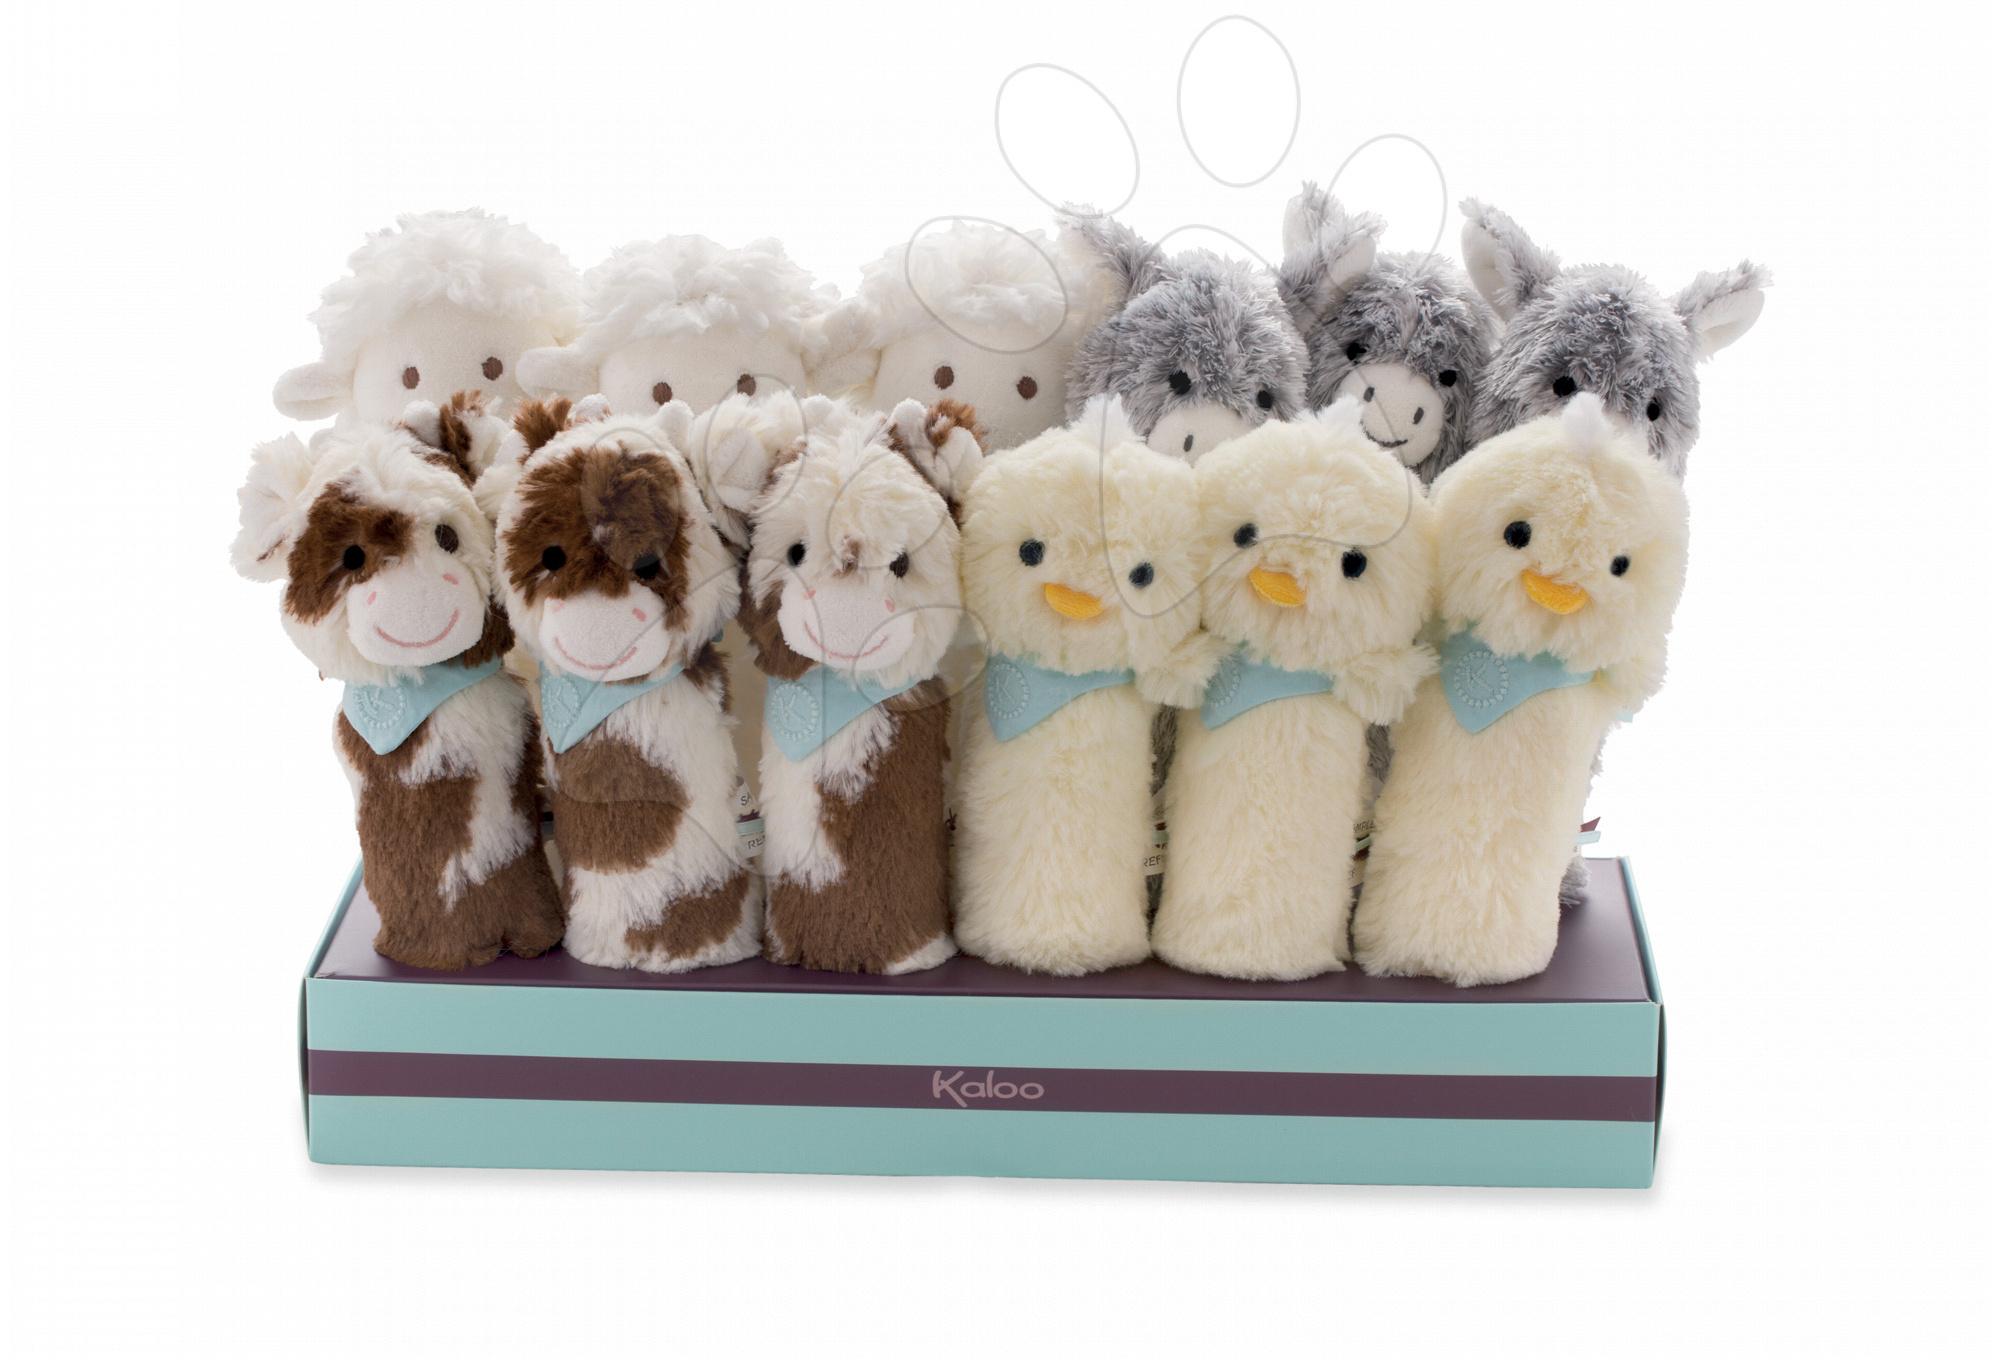 Kaloo plyšová hrkálka pre bábätko Les Amis zvieratko 962978